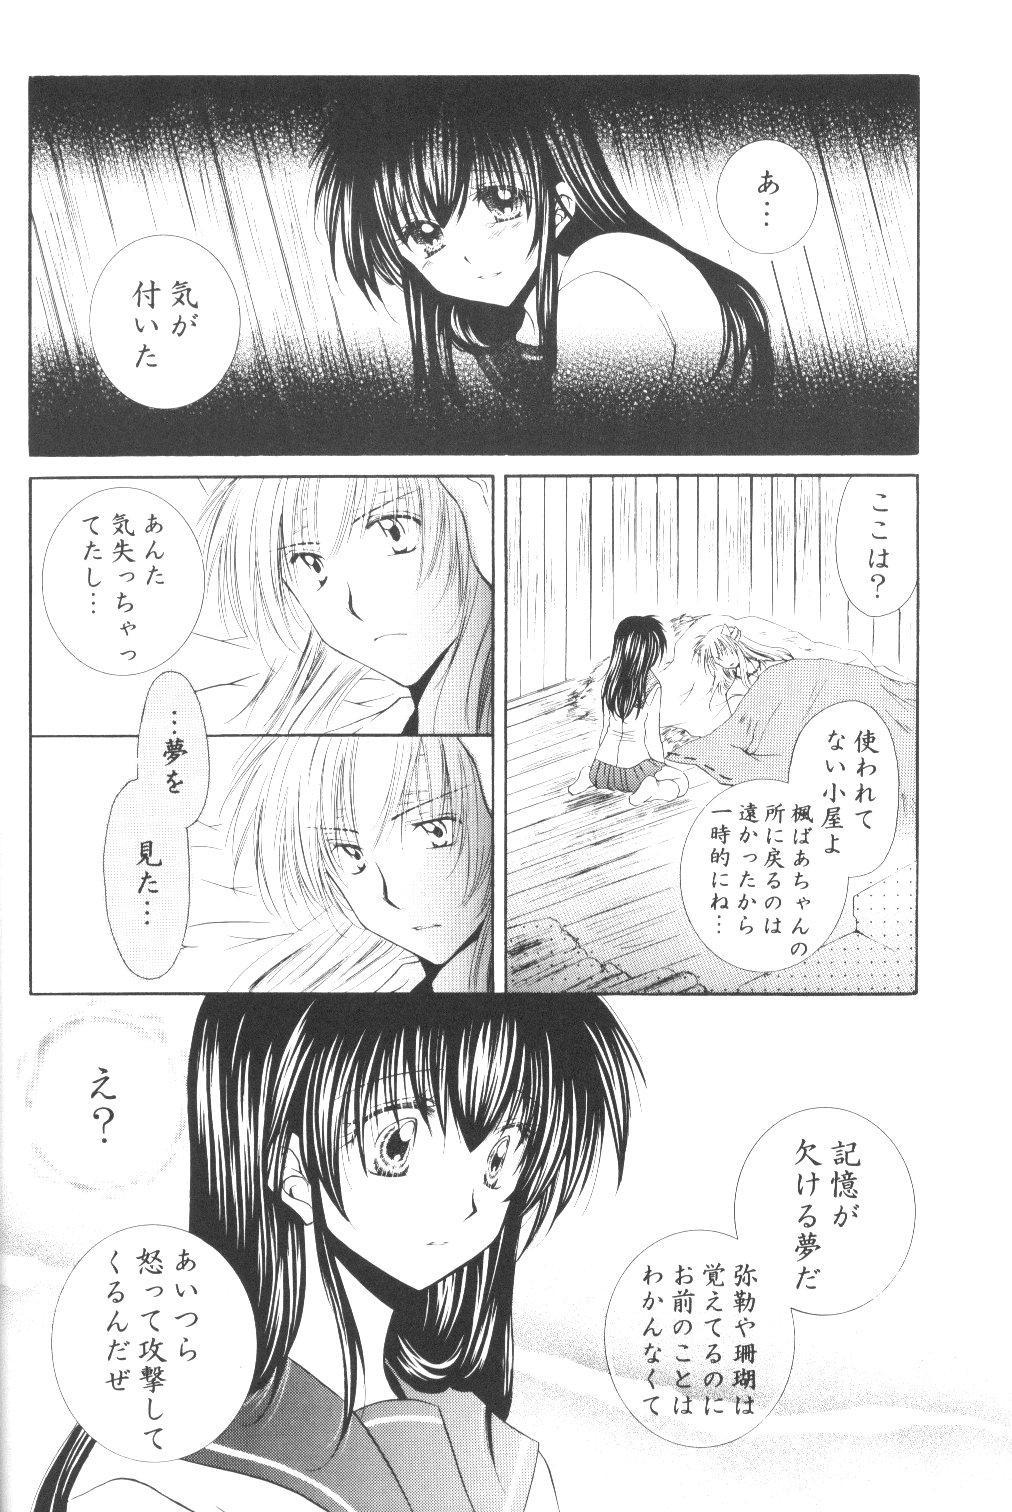 Ryuusei Ryodan 33